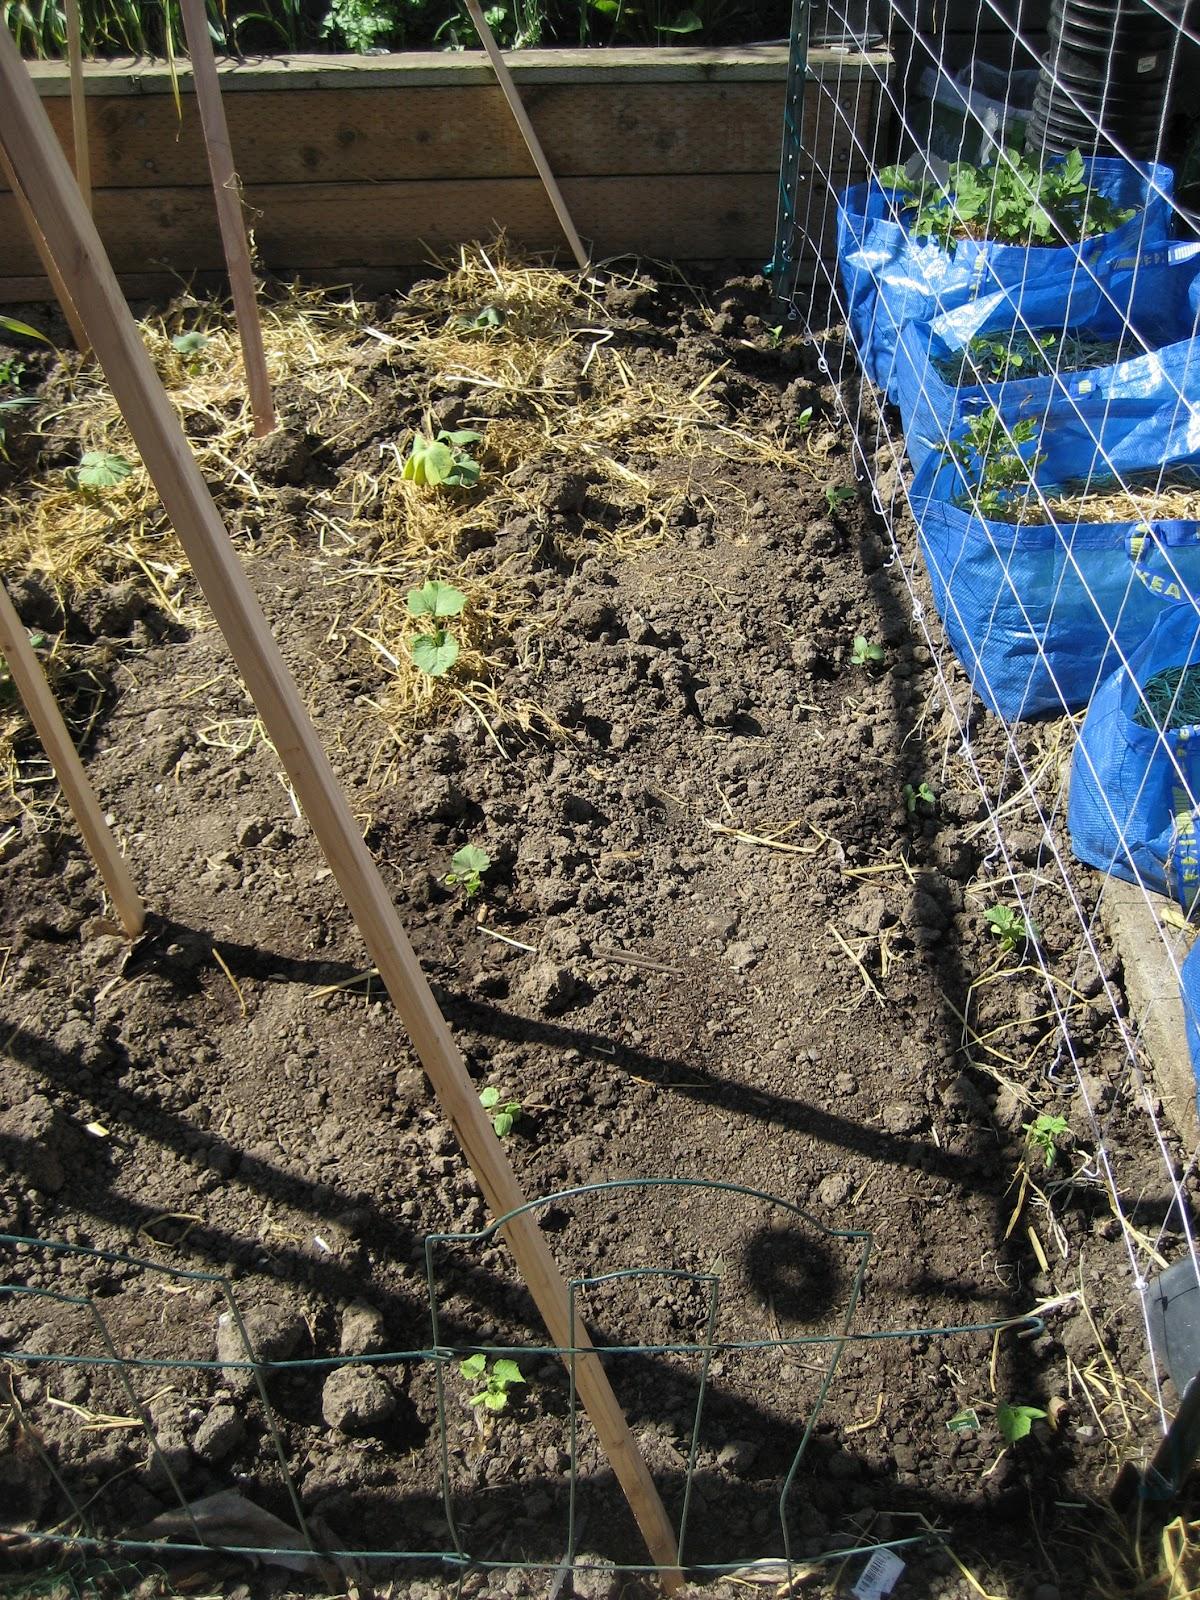 backyard farming growing winter squash vertically